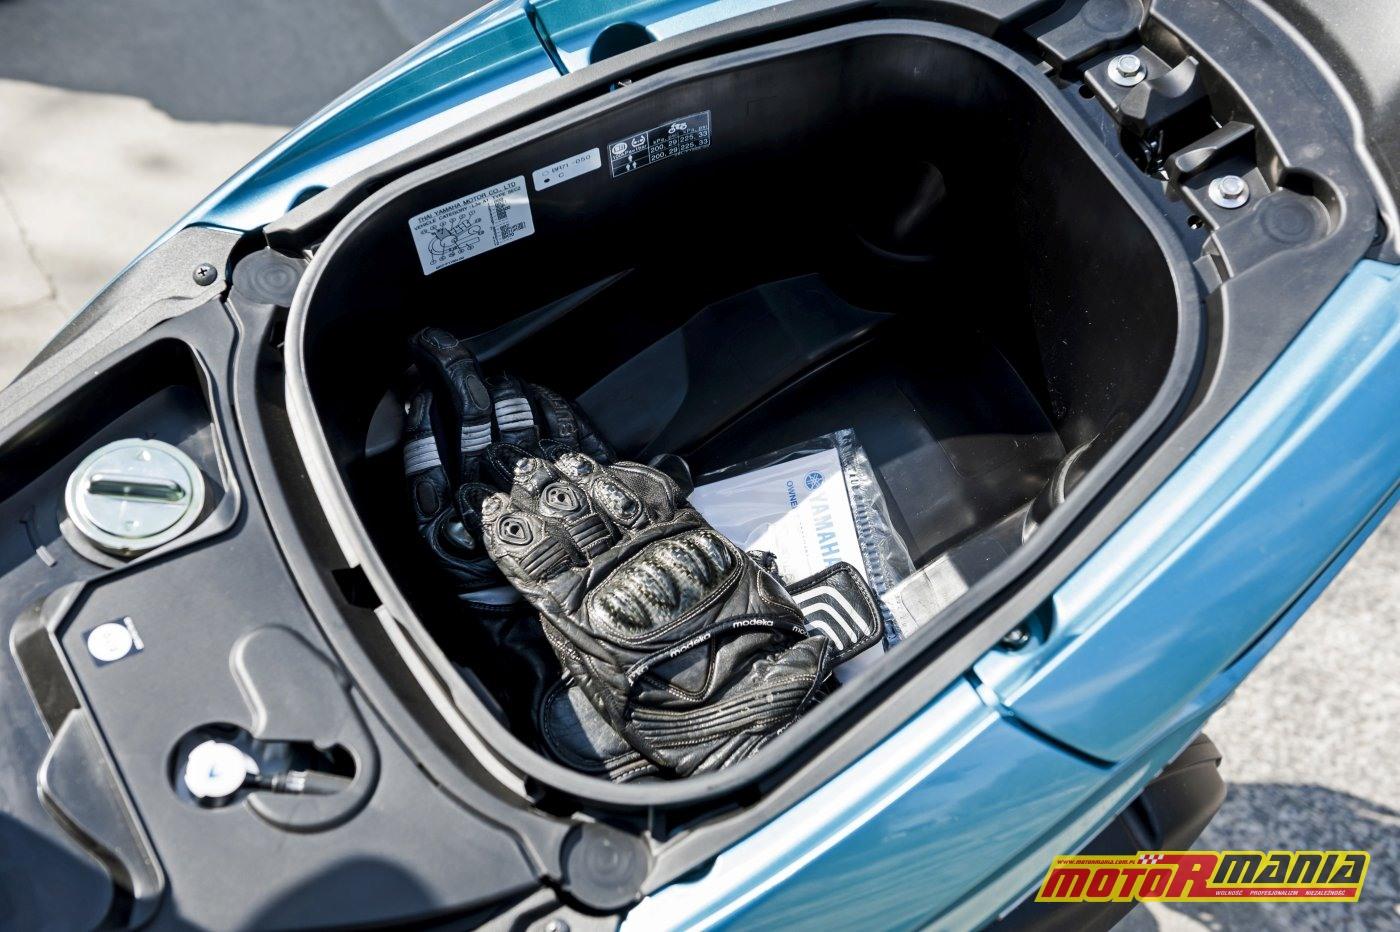 Yamaha Tricity 125 test motormania - fot Tomazi_pl (11)